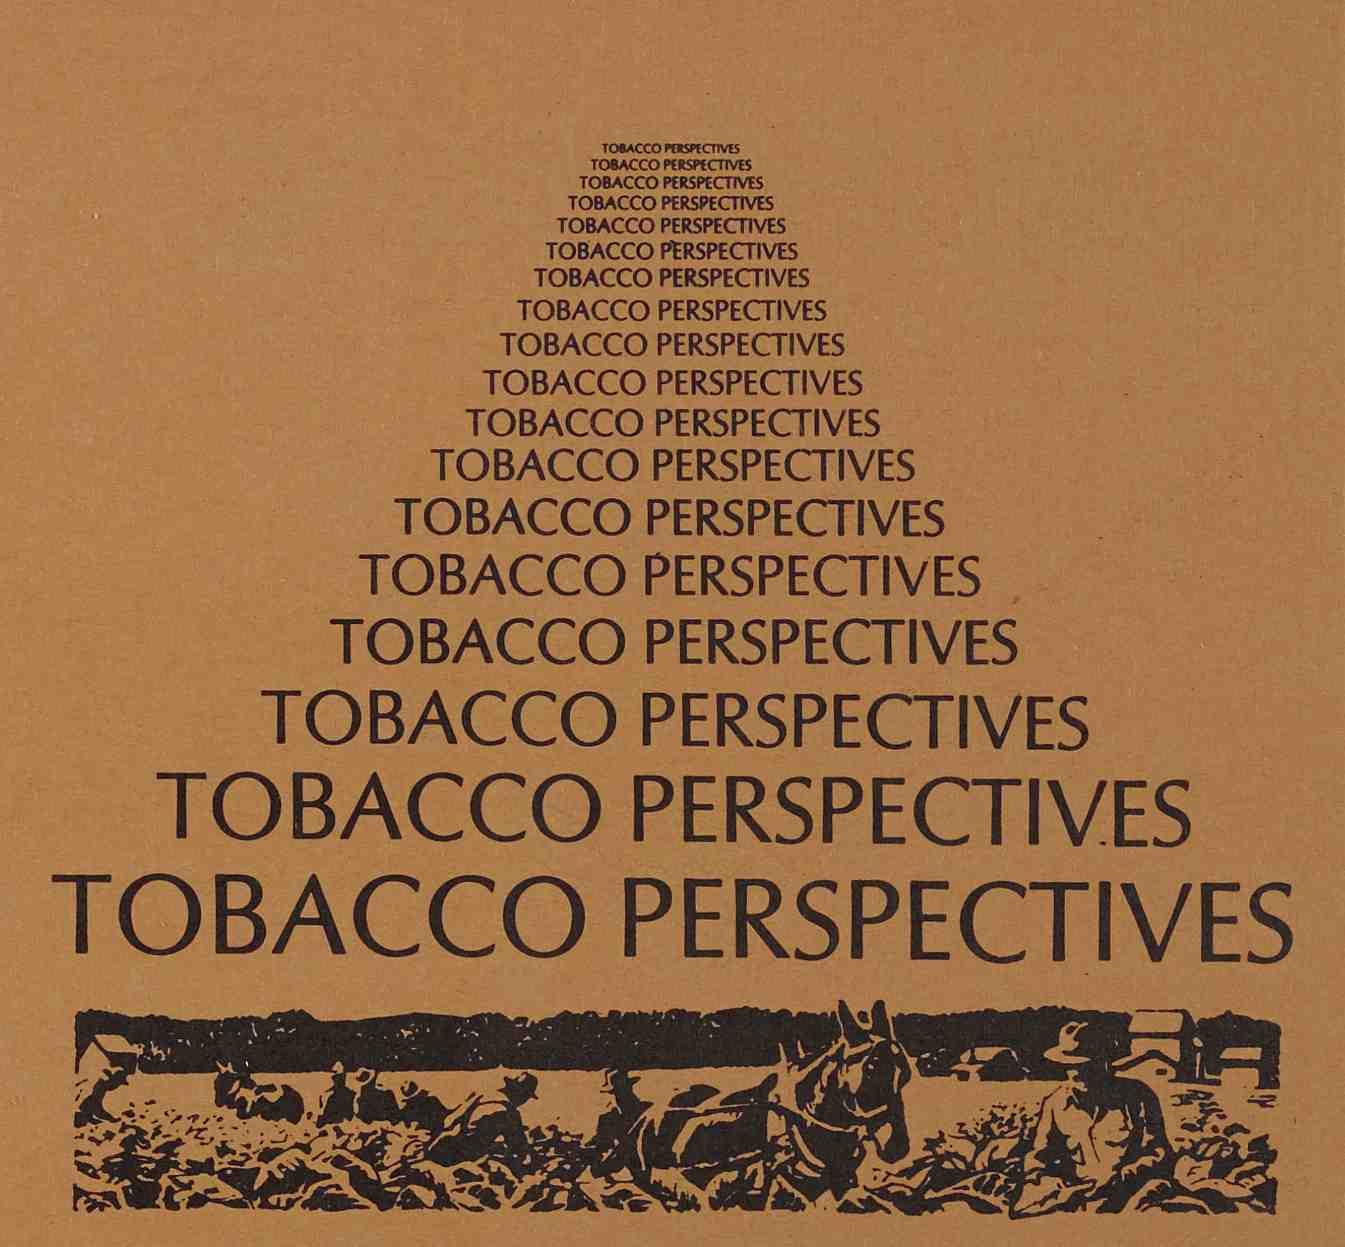 Tobacco Perspectives Brochure